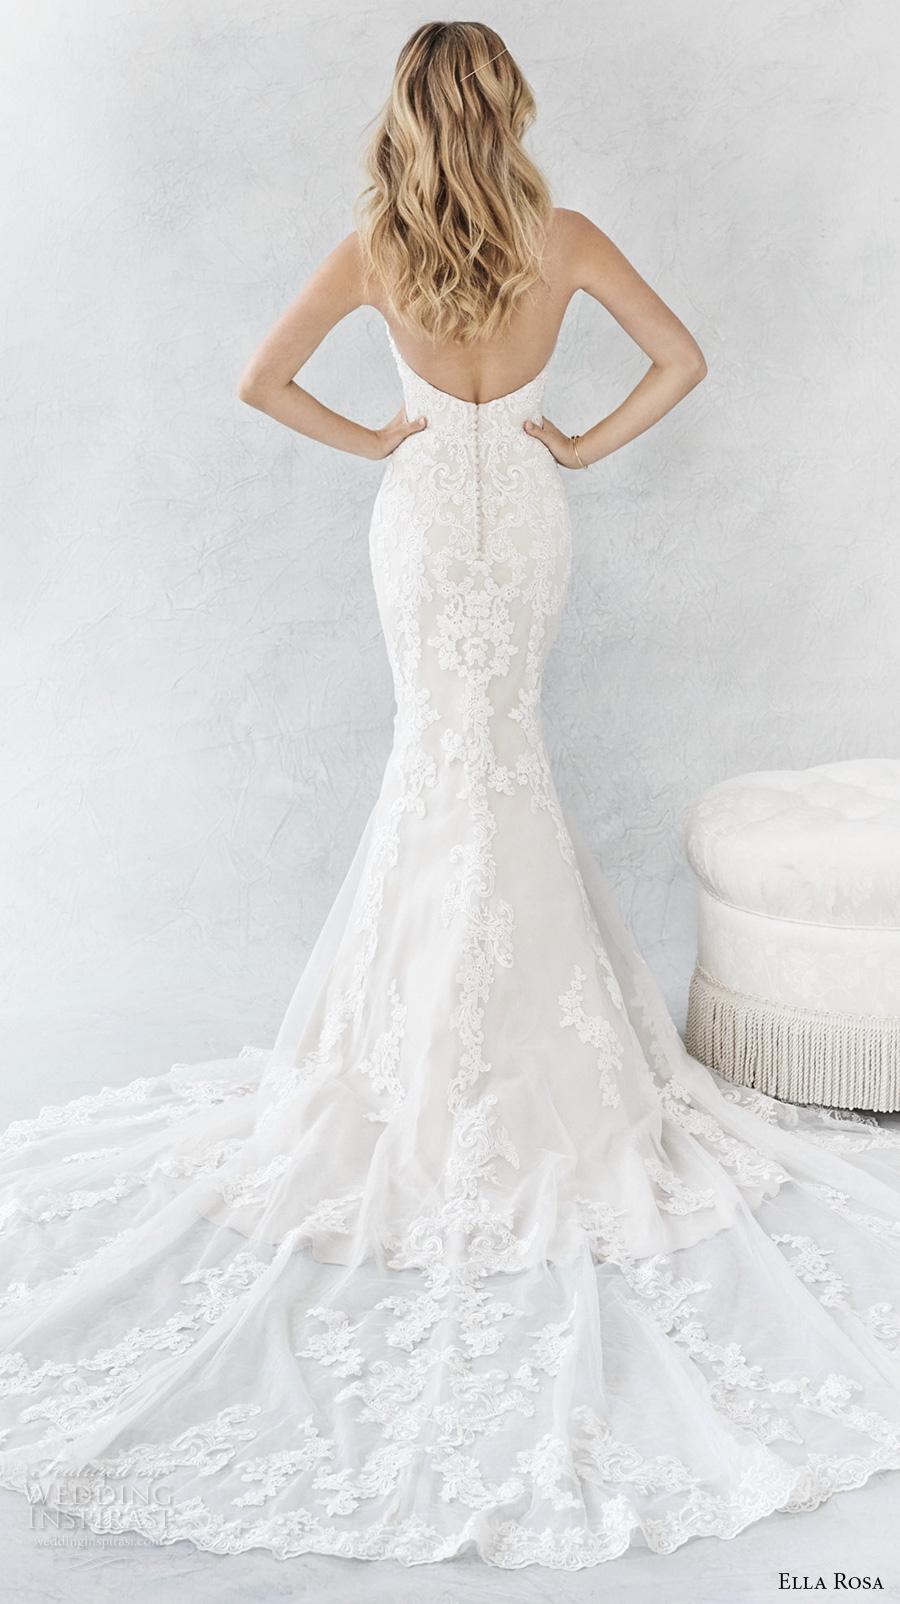 ella rosa spring 2017 bridal sleeveless strapless deep sweetheart neckline heavily embellished bodice elegant romantic mermaid wedding dress (372) bv